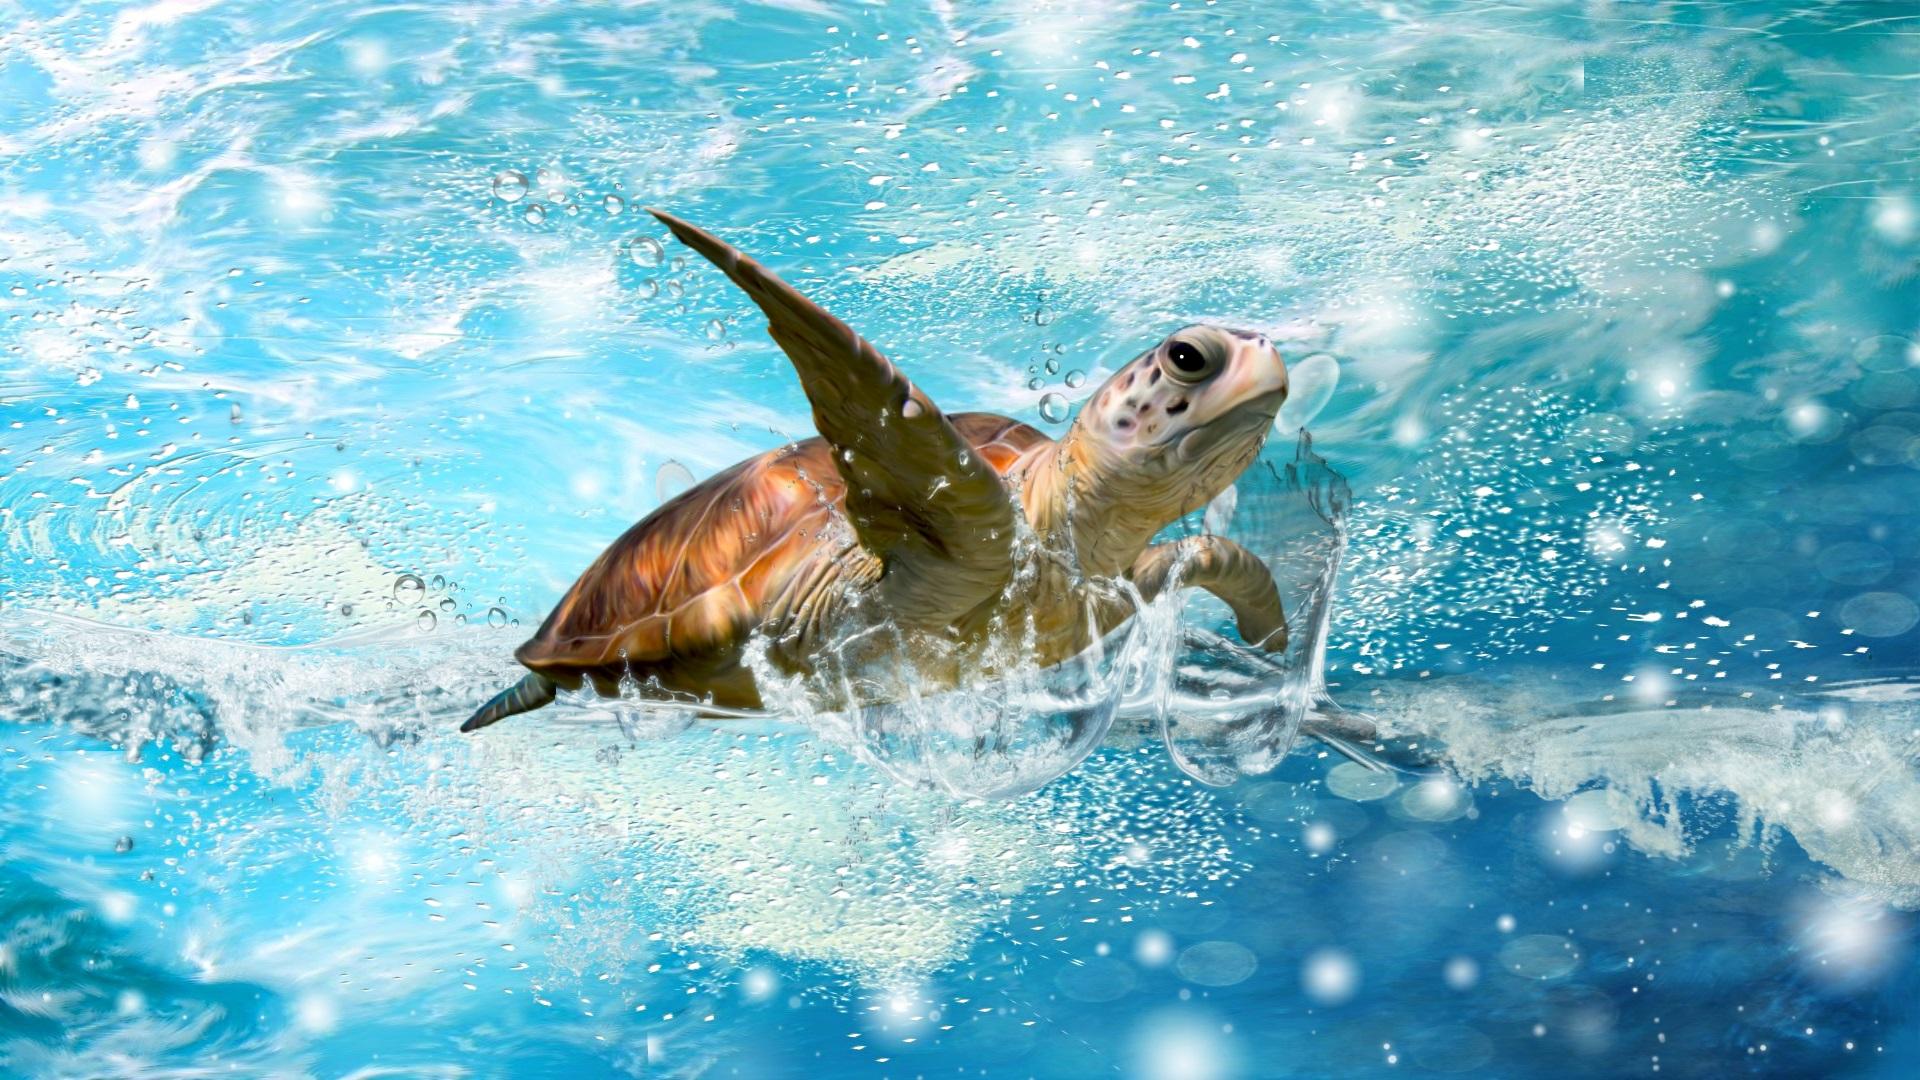 Wallpaper : turtle, water, beach, shell 1920x1440